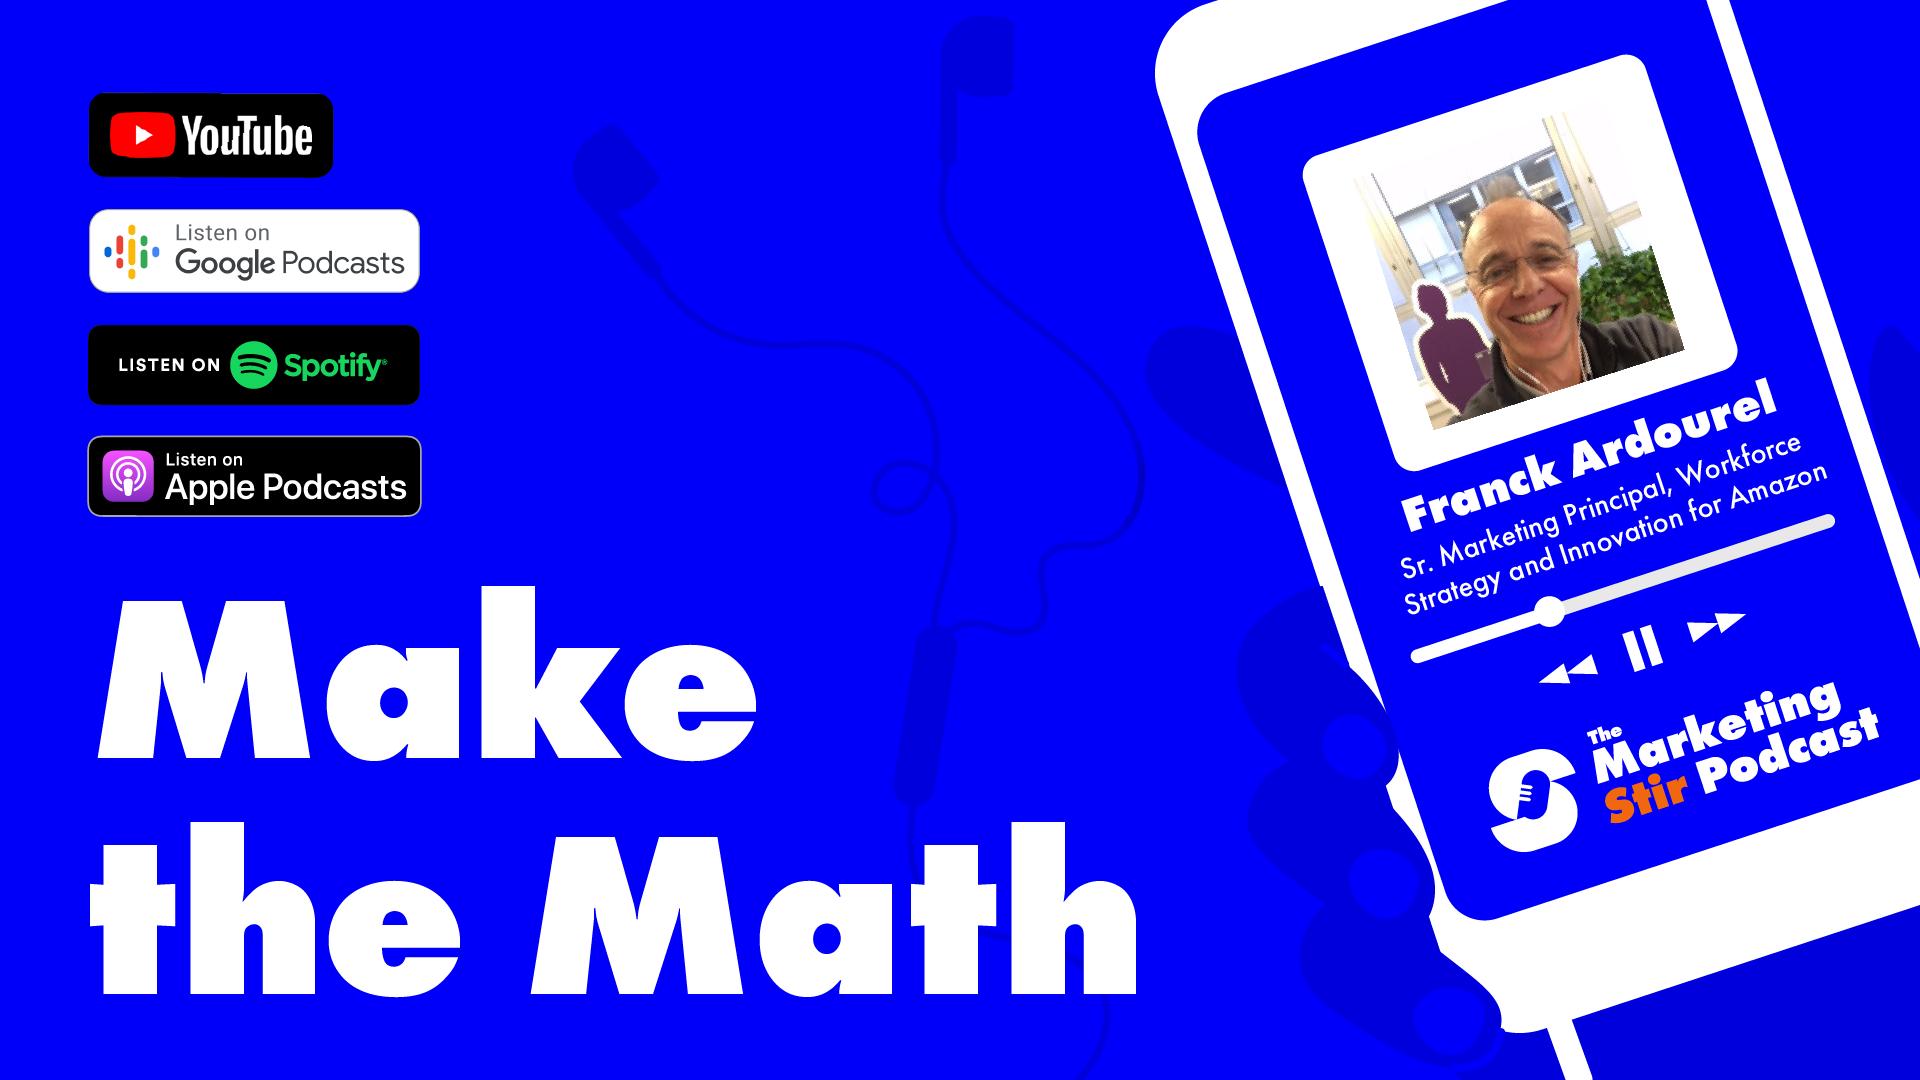 Franck Ardourel (Amazon) - Make the Math